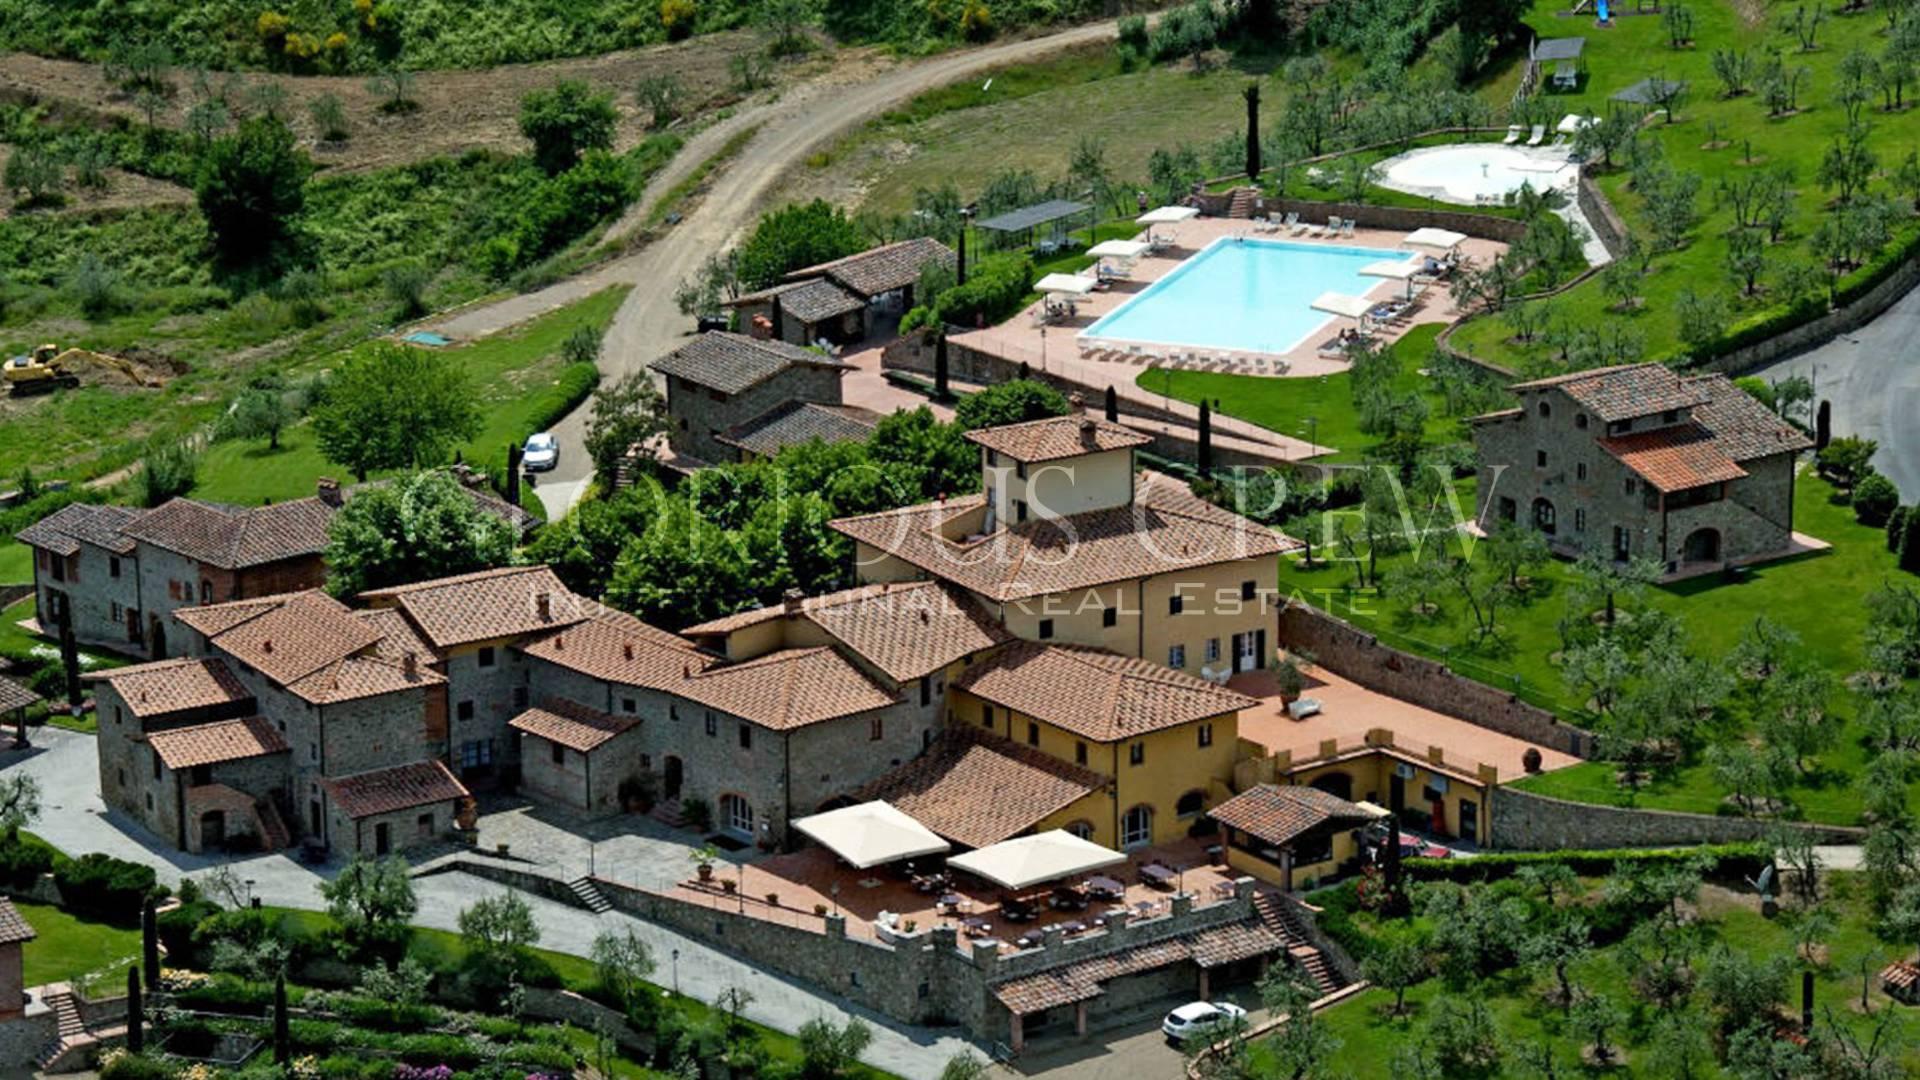 Albergo in Vendita a Montevarchi: 7700 mq